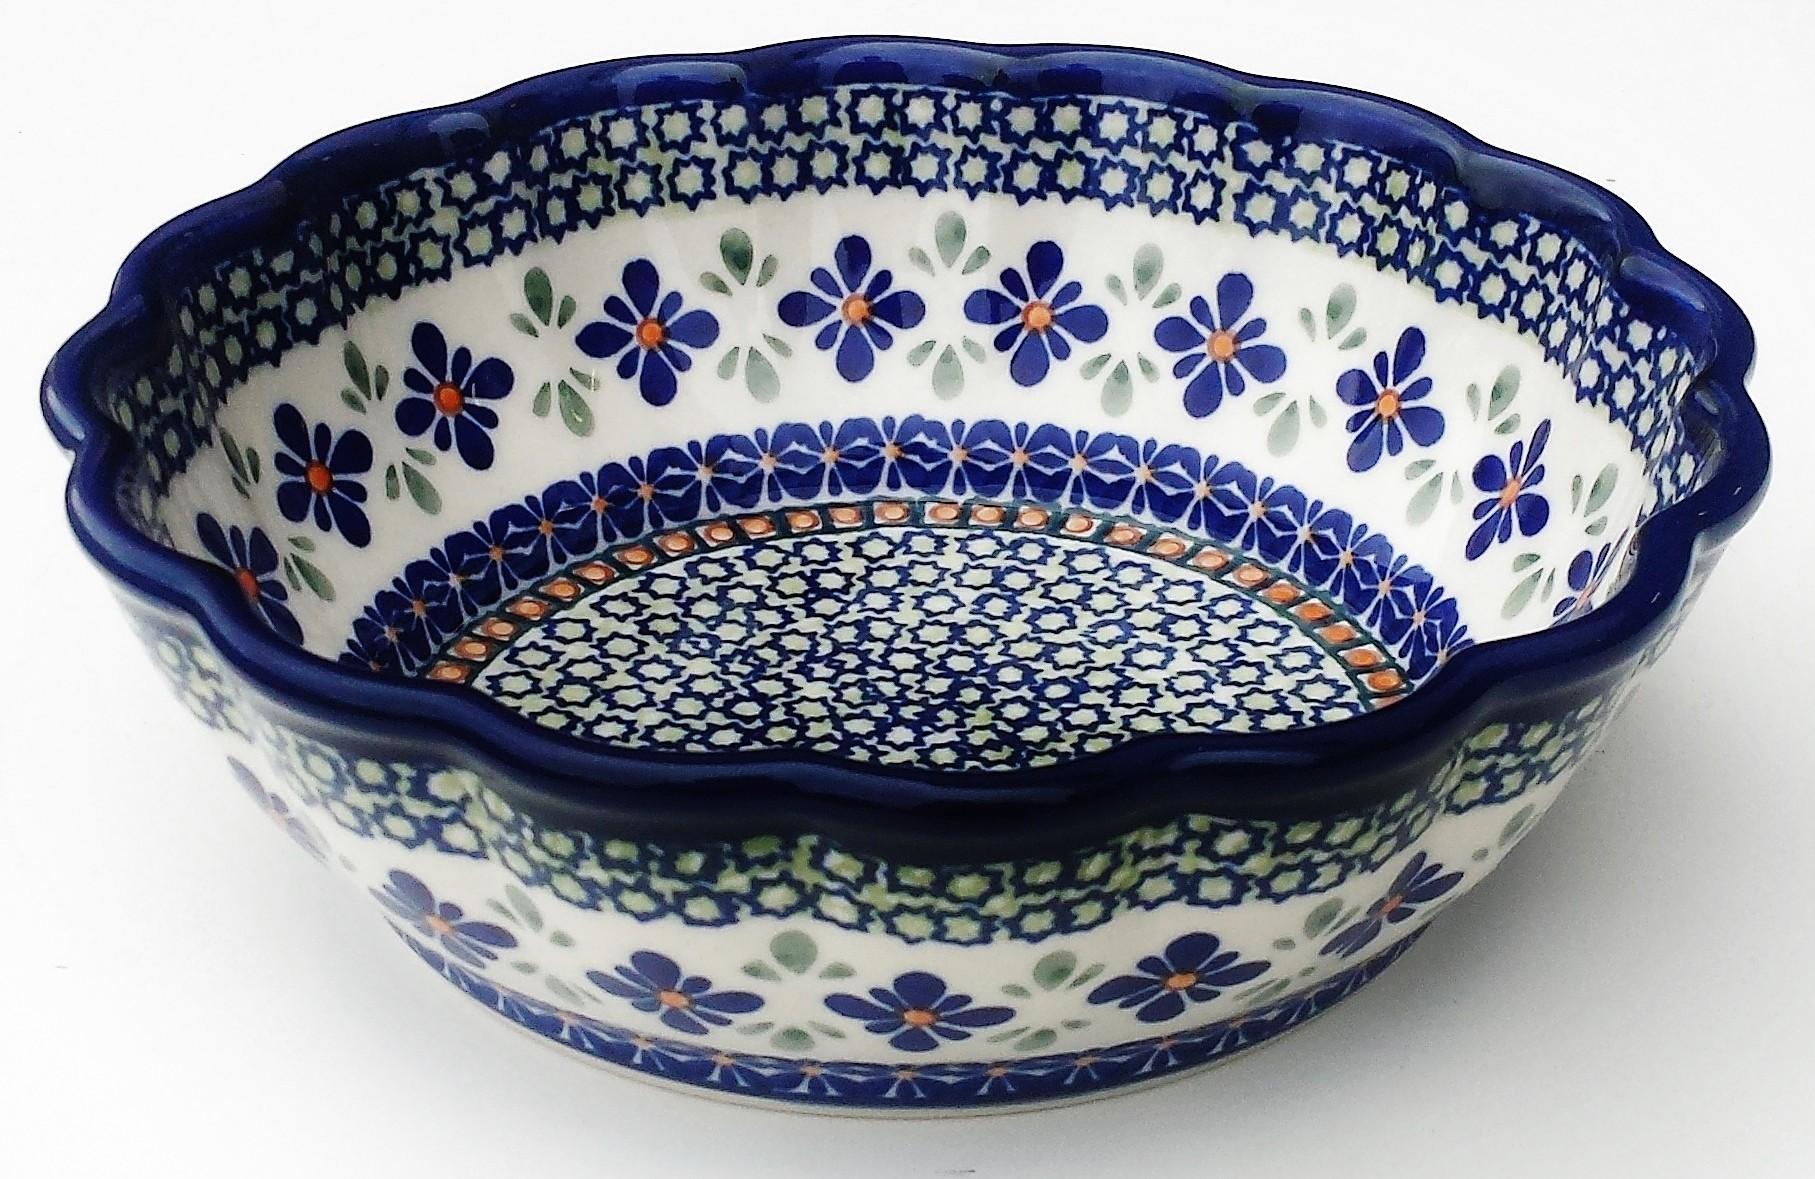 Pottery Avenue SWEETIE PIE Scalloped Stoneware Serving Bowl | ARTISAN